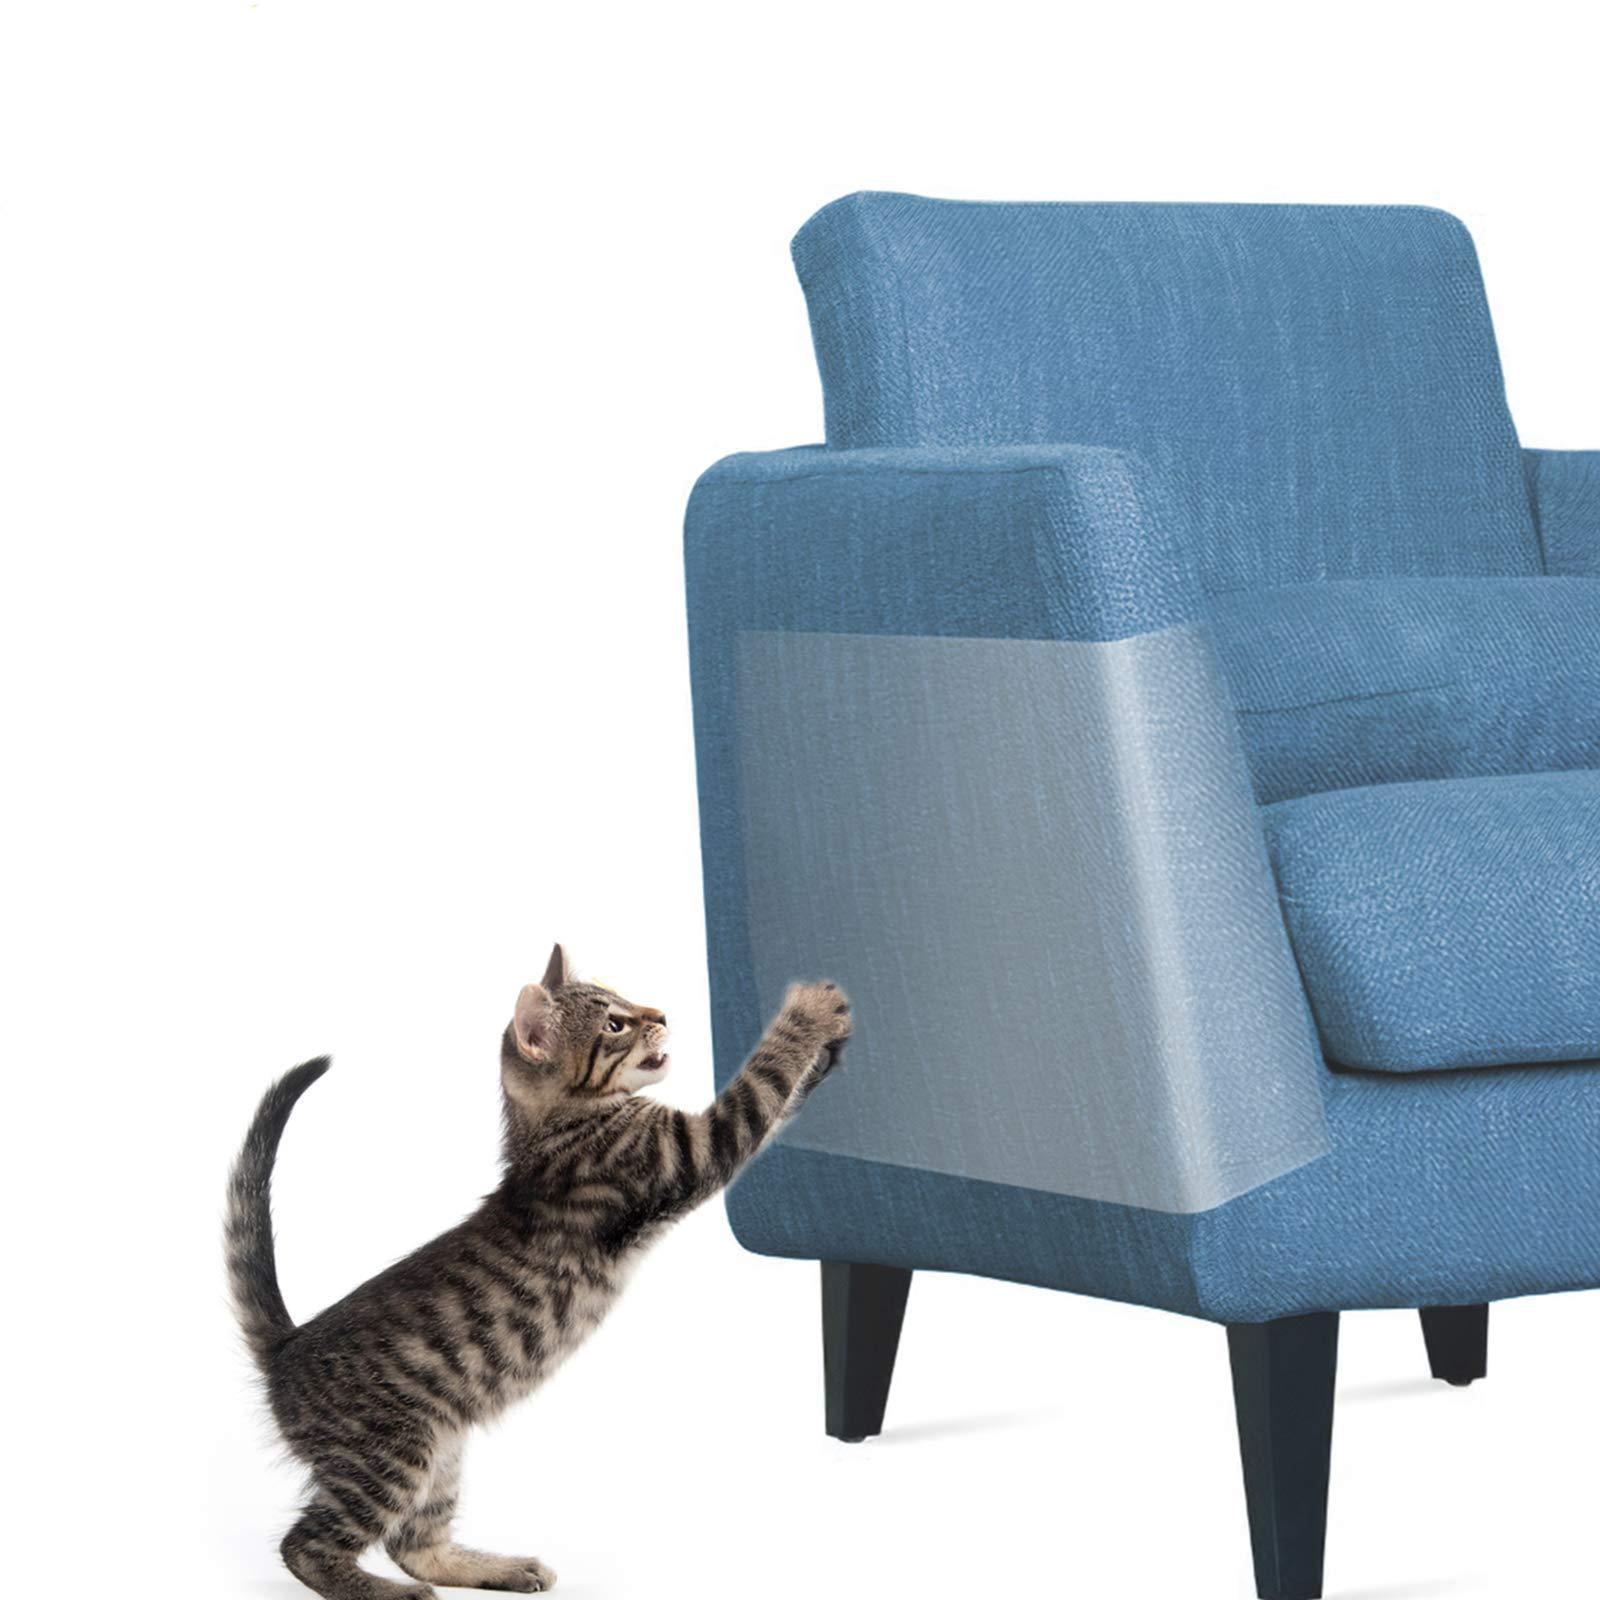 Anti gato scratcher guarda gato arranhando pós móveis sofá protetor gato raspador fita anti-dissuasor paw pads tapete protetor